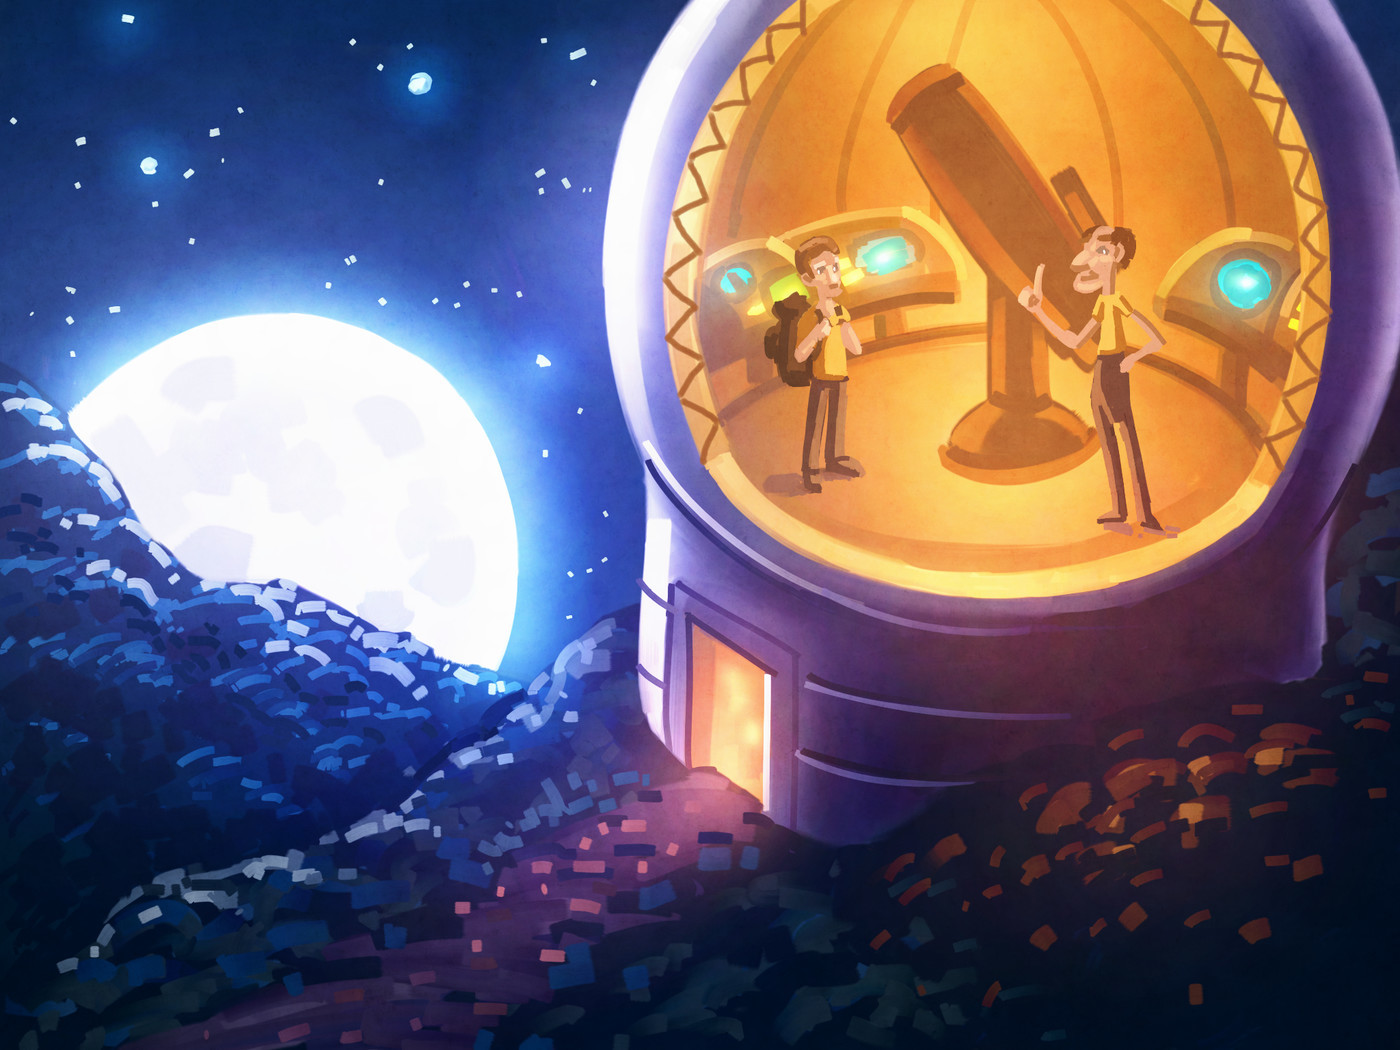 Brett stebbins intro observatory extr concept 04 1400w